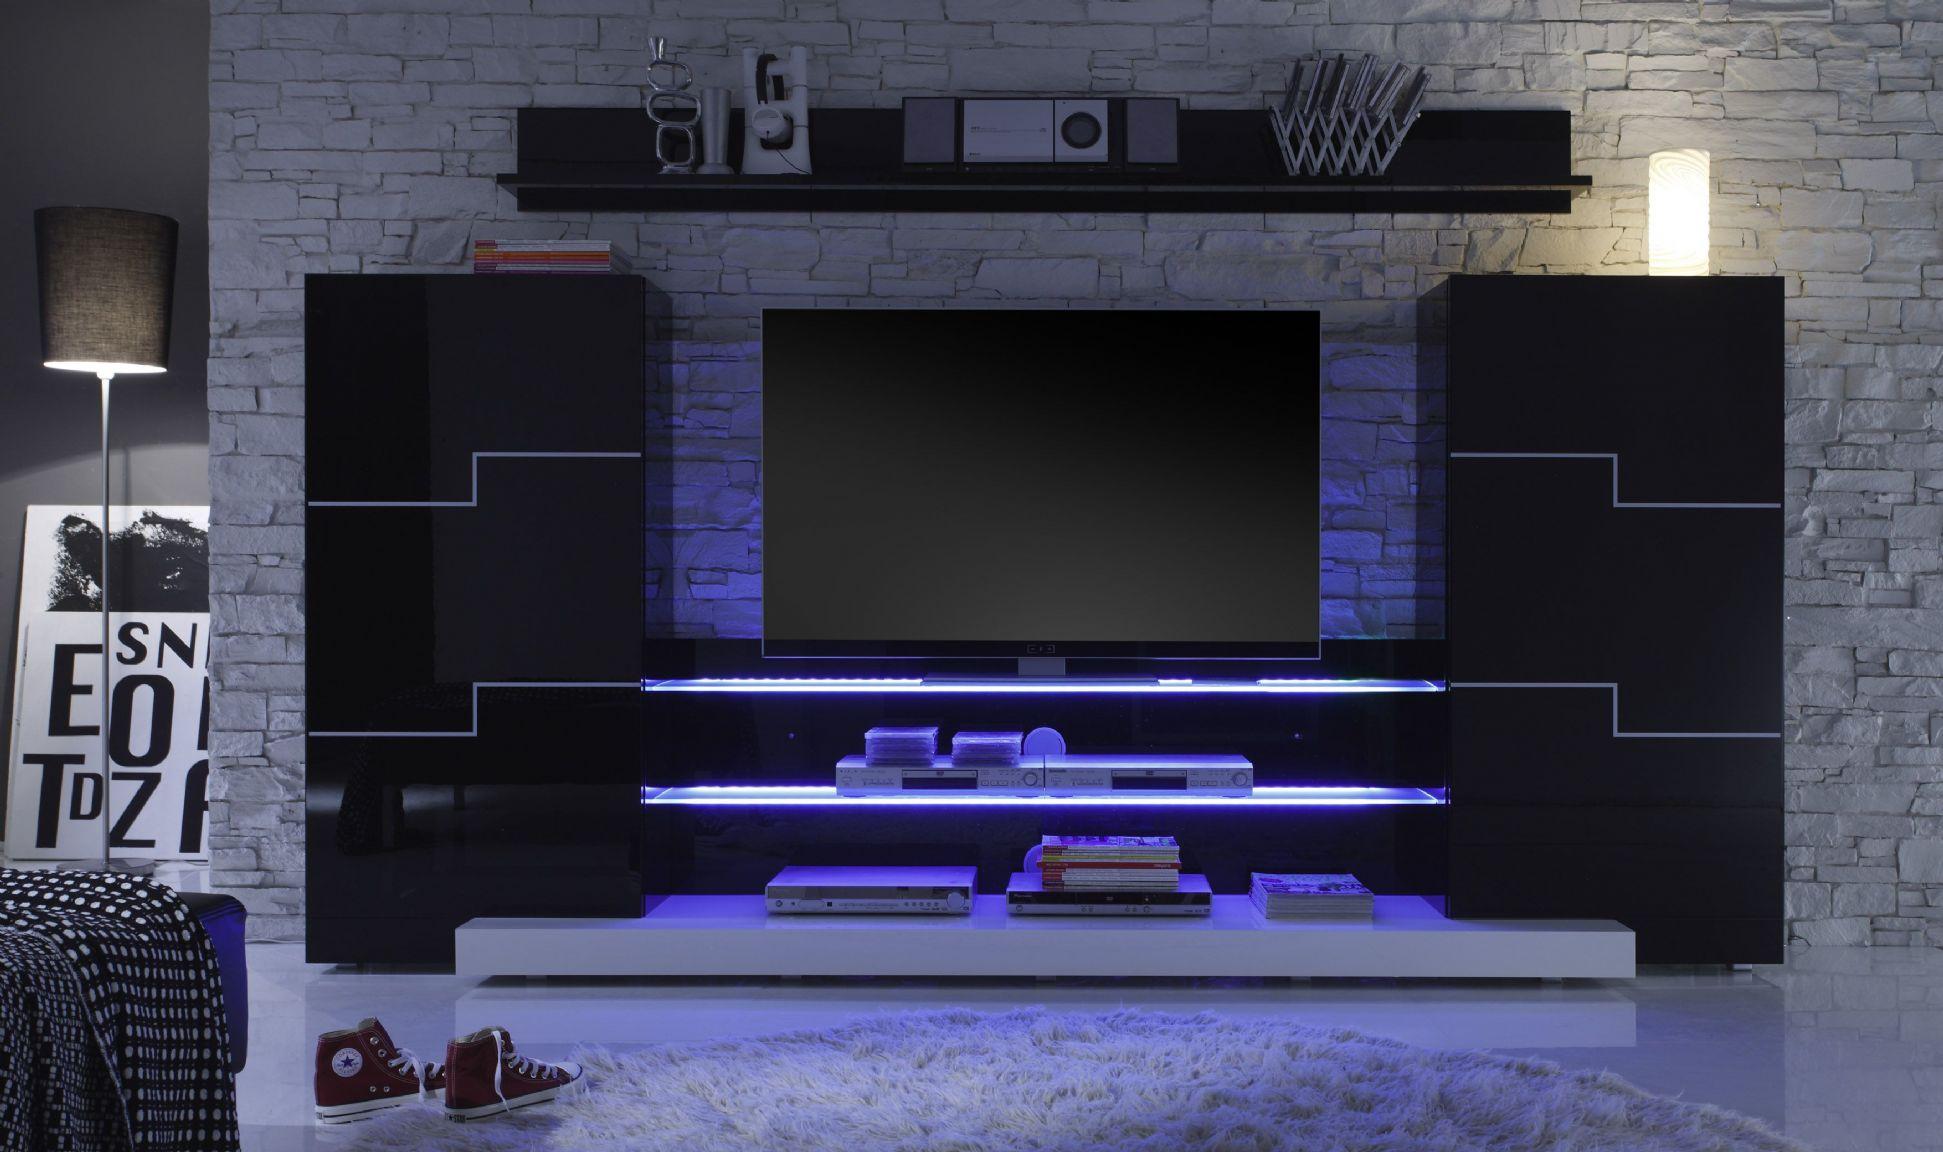 Gentil Tv Unit Ideas Wall Mounted Tv Unit Designs Tv Unit Design For Living Room Tv  Cabinet